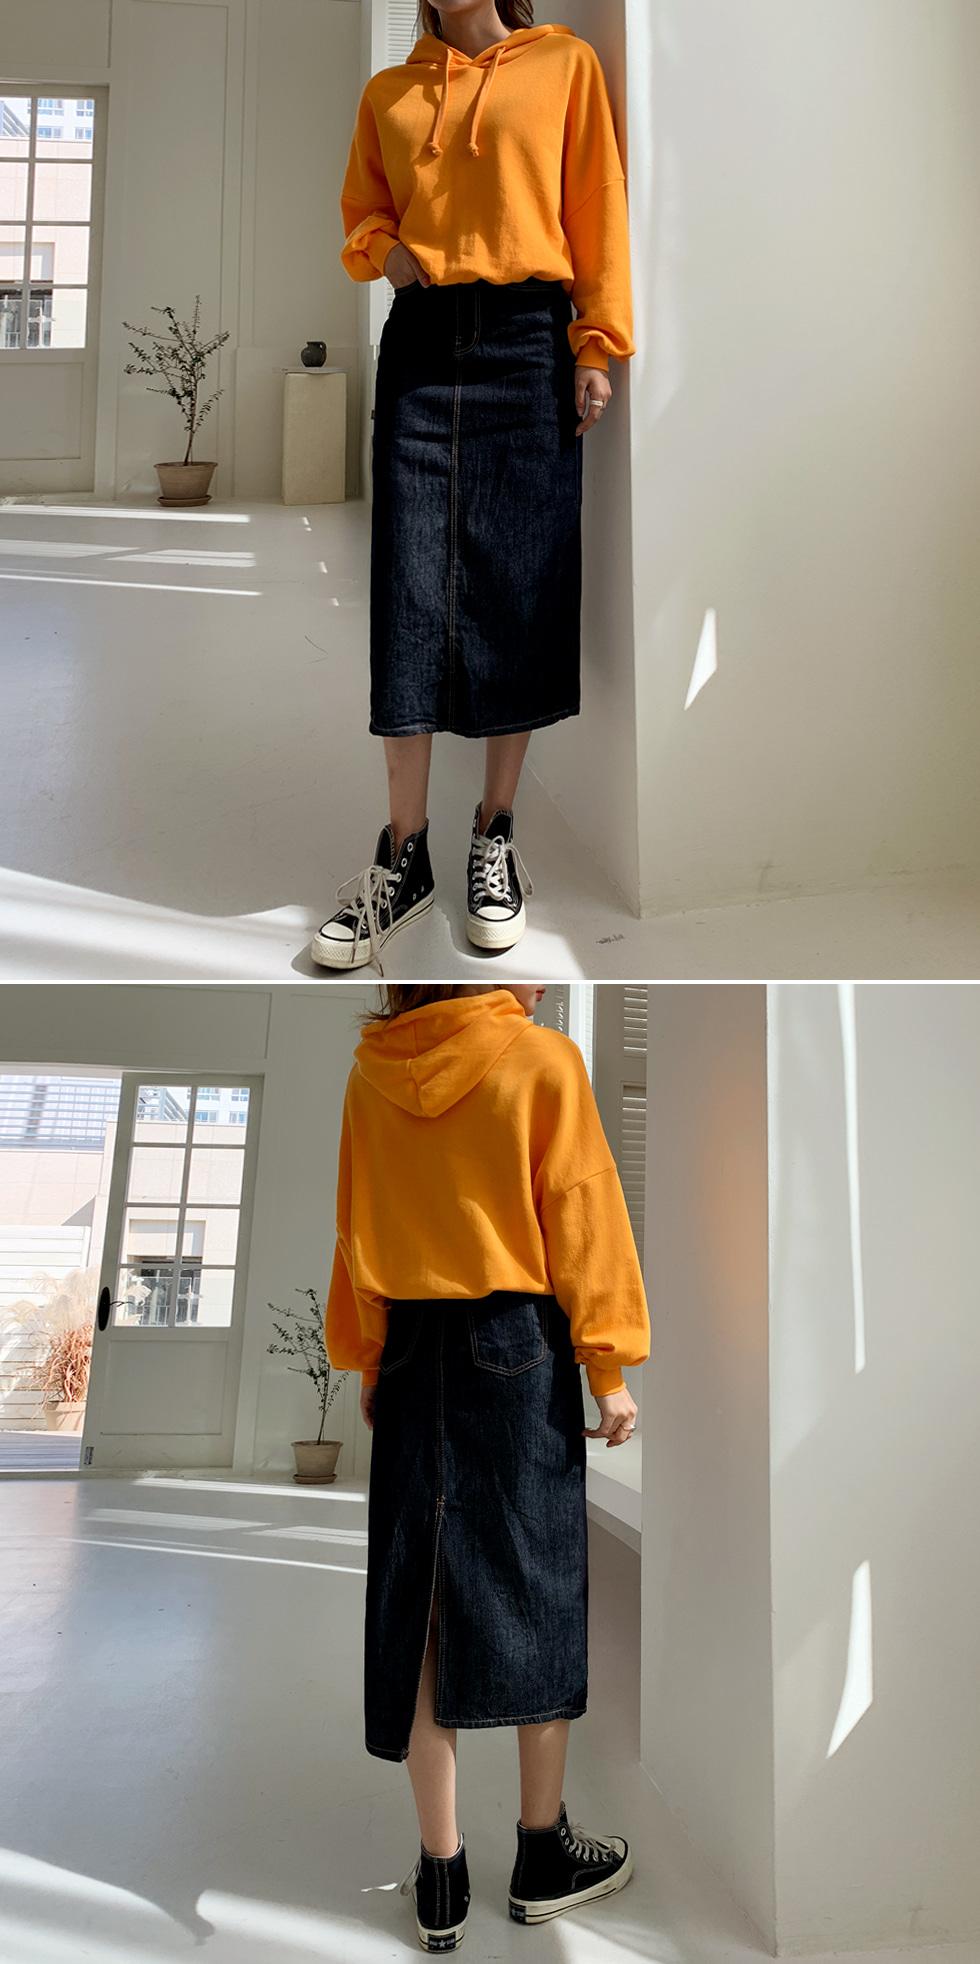 True saenggi long skirt